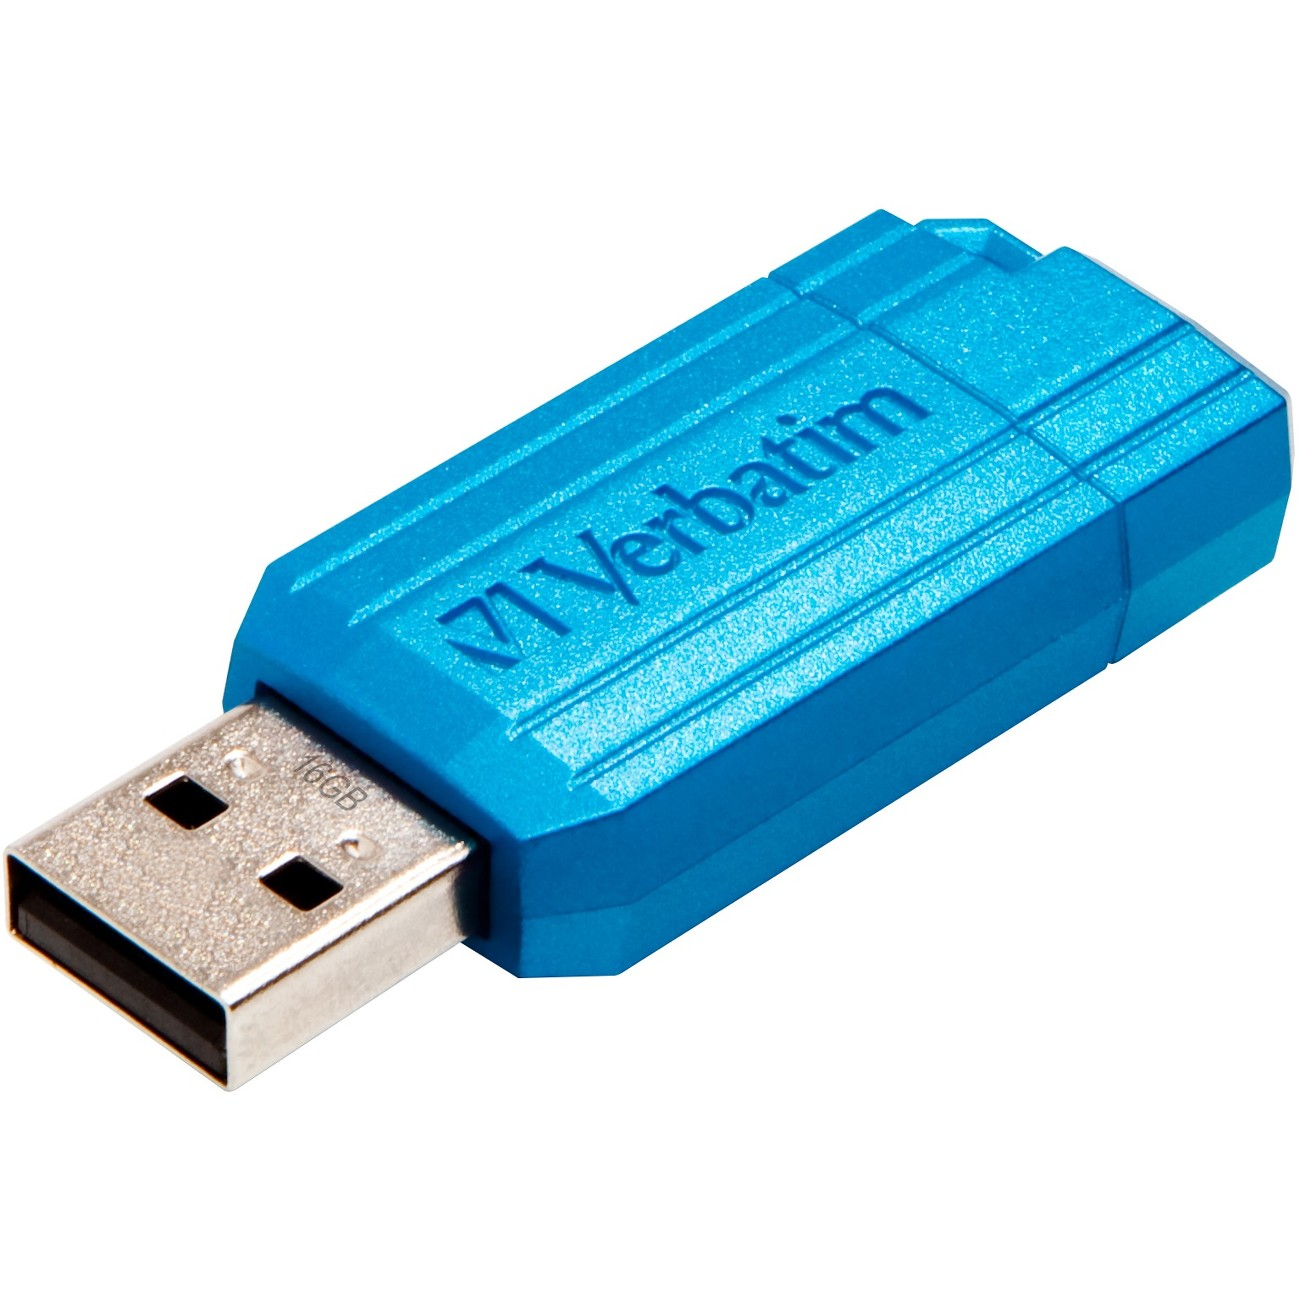 Verbatim 16GB PinStripe USB Flash Drive - Carribean Blue (49068)